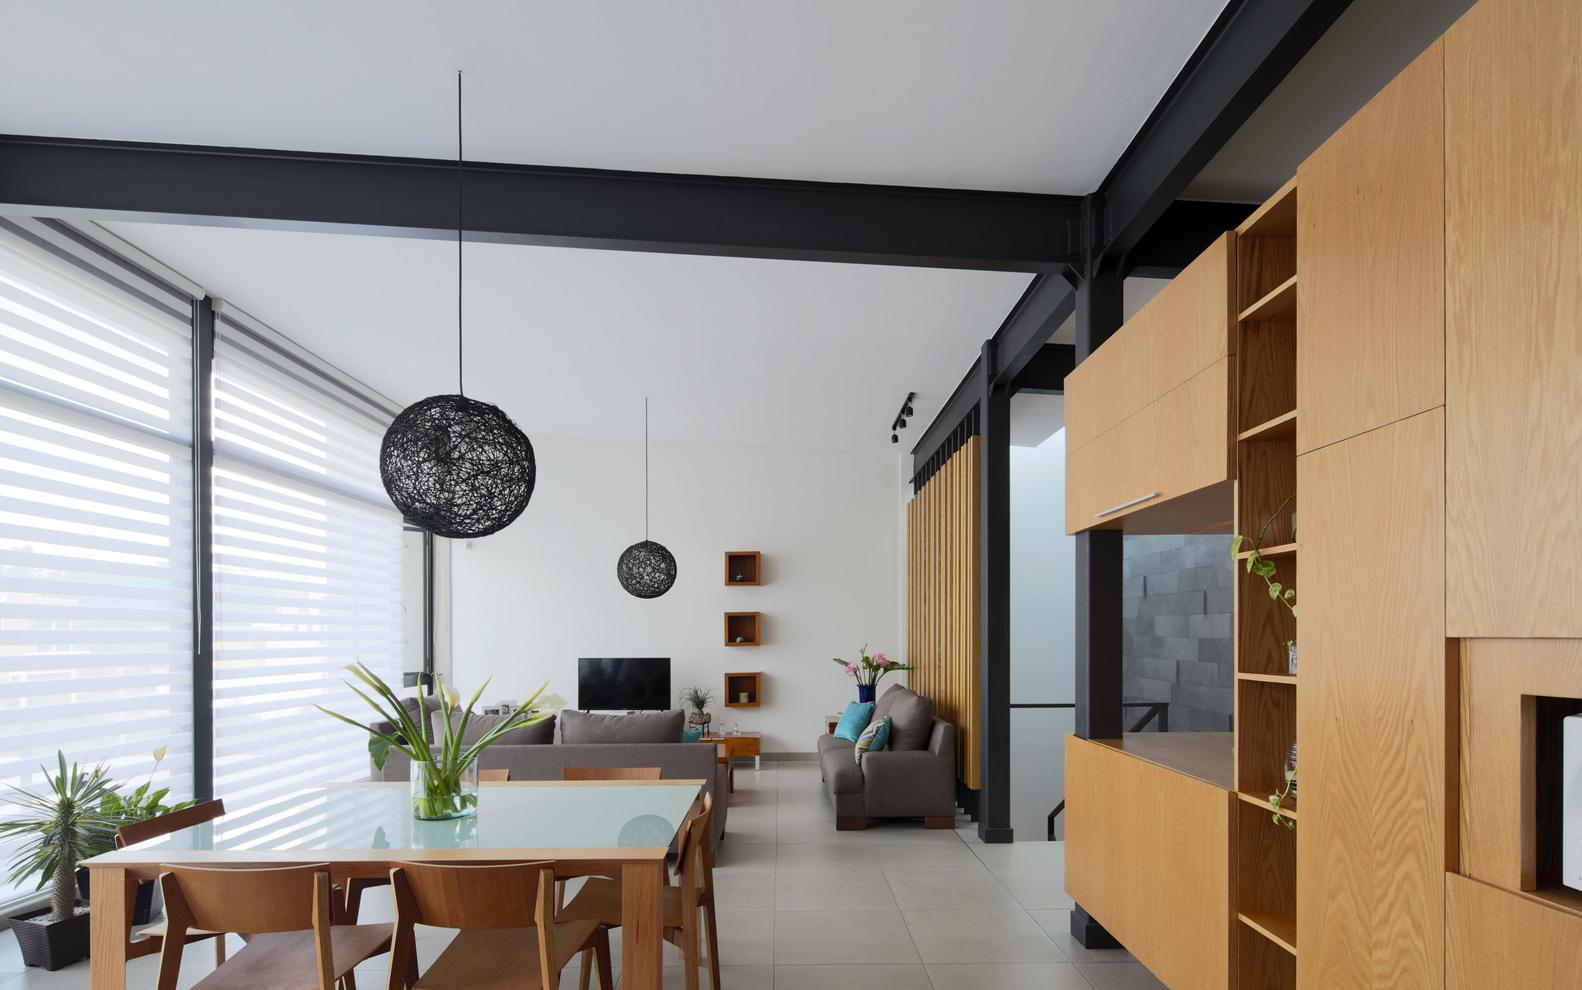 Gallery of Casa Milán / BCA Taller de Diseño - 1